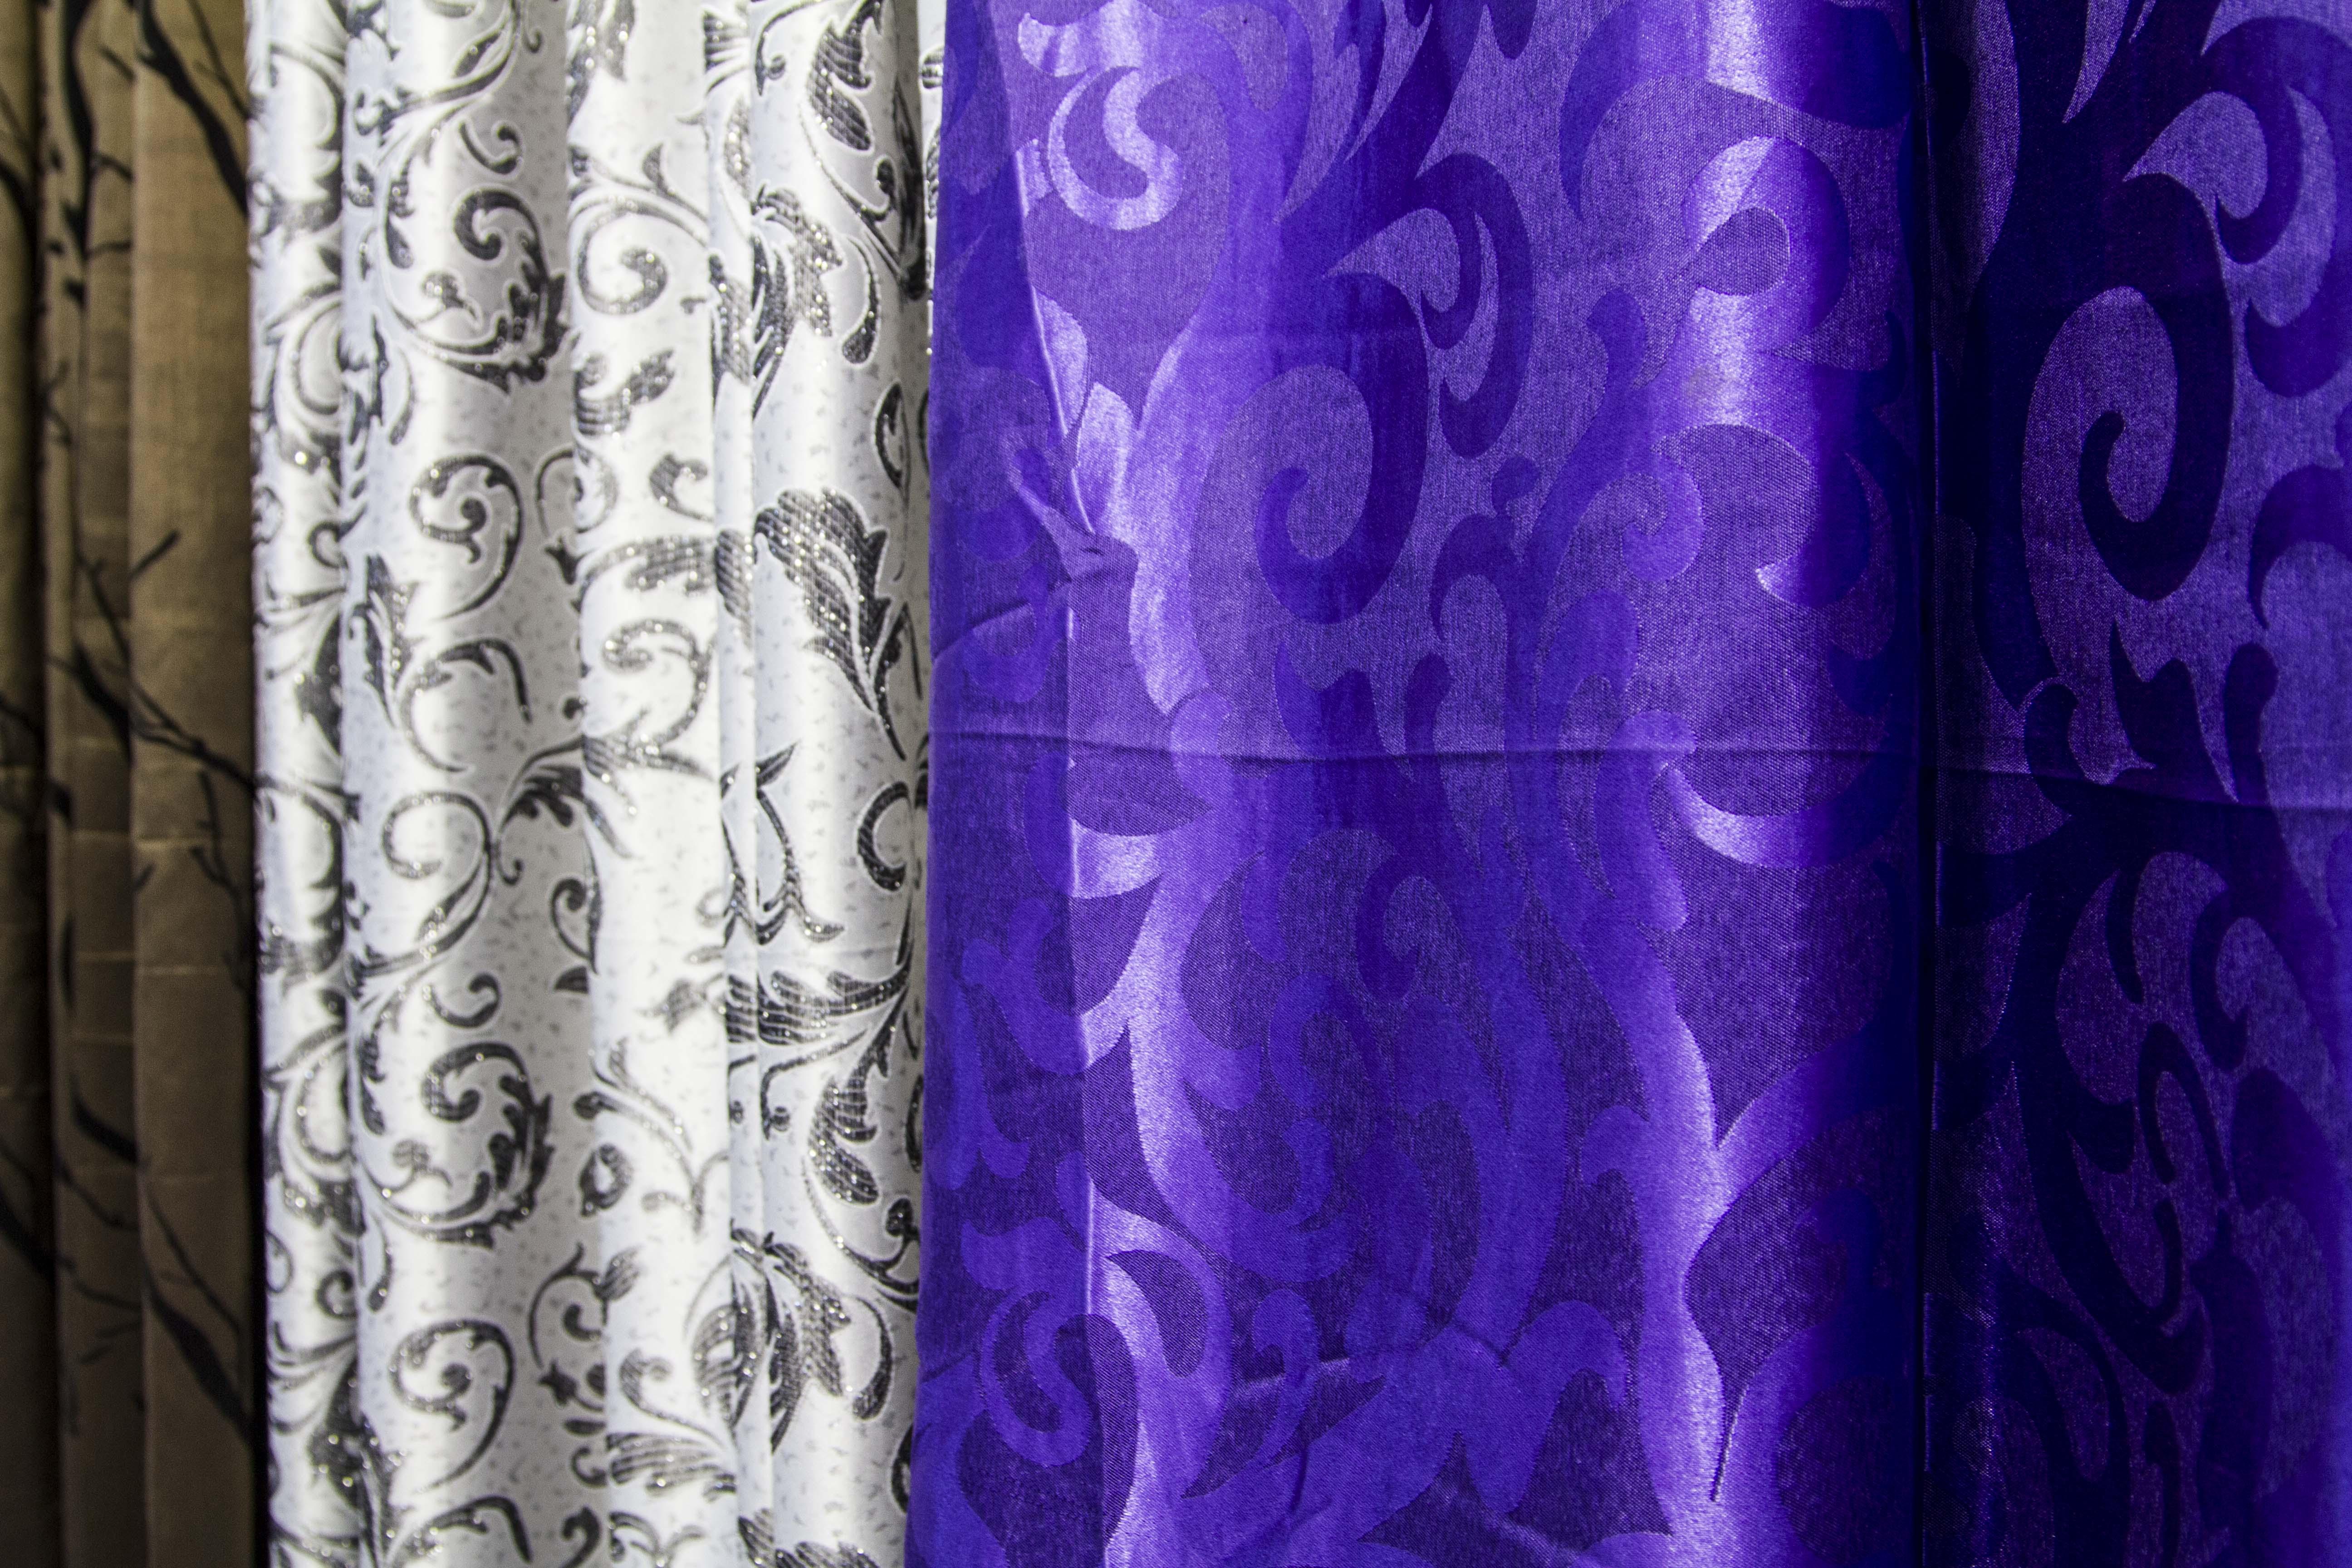 Montana Family Market_Sufi Curtain House_various curtain marterials